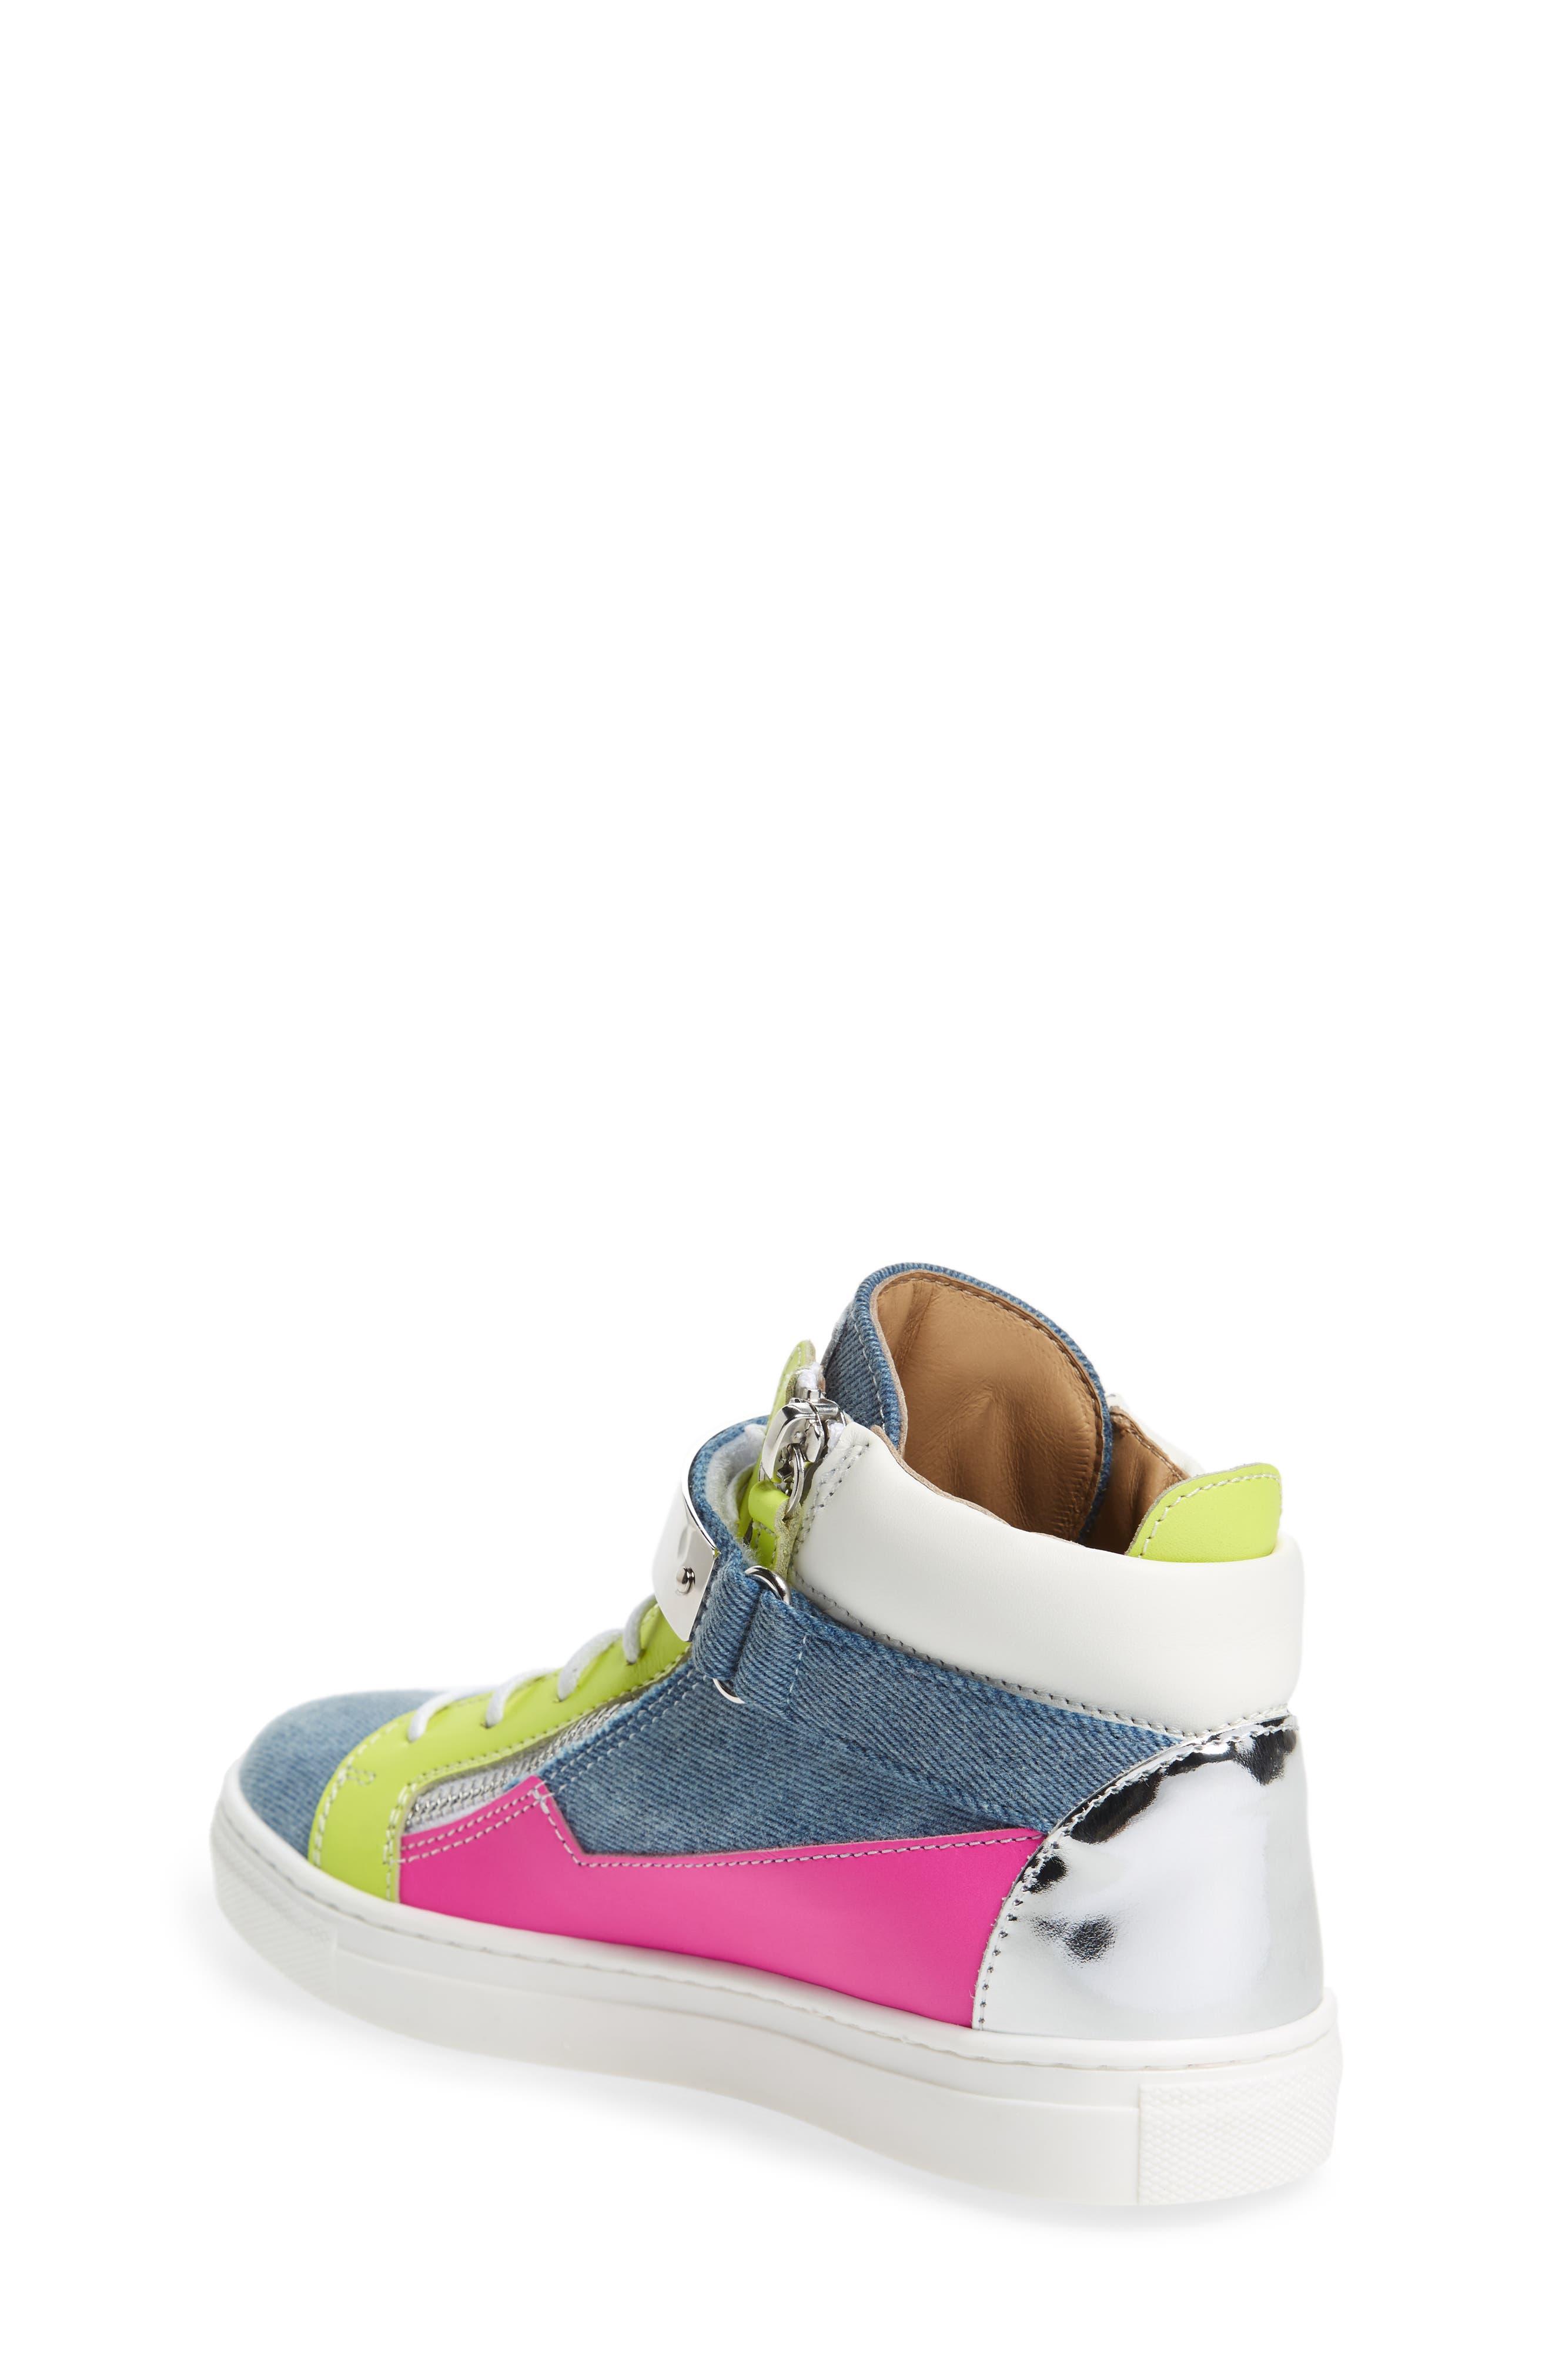 London High Top Sneaker,                             Alternate thumbnail 2, color,                             400